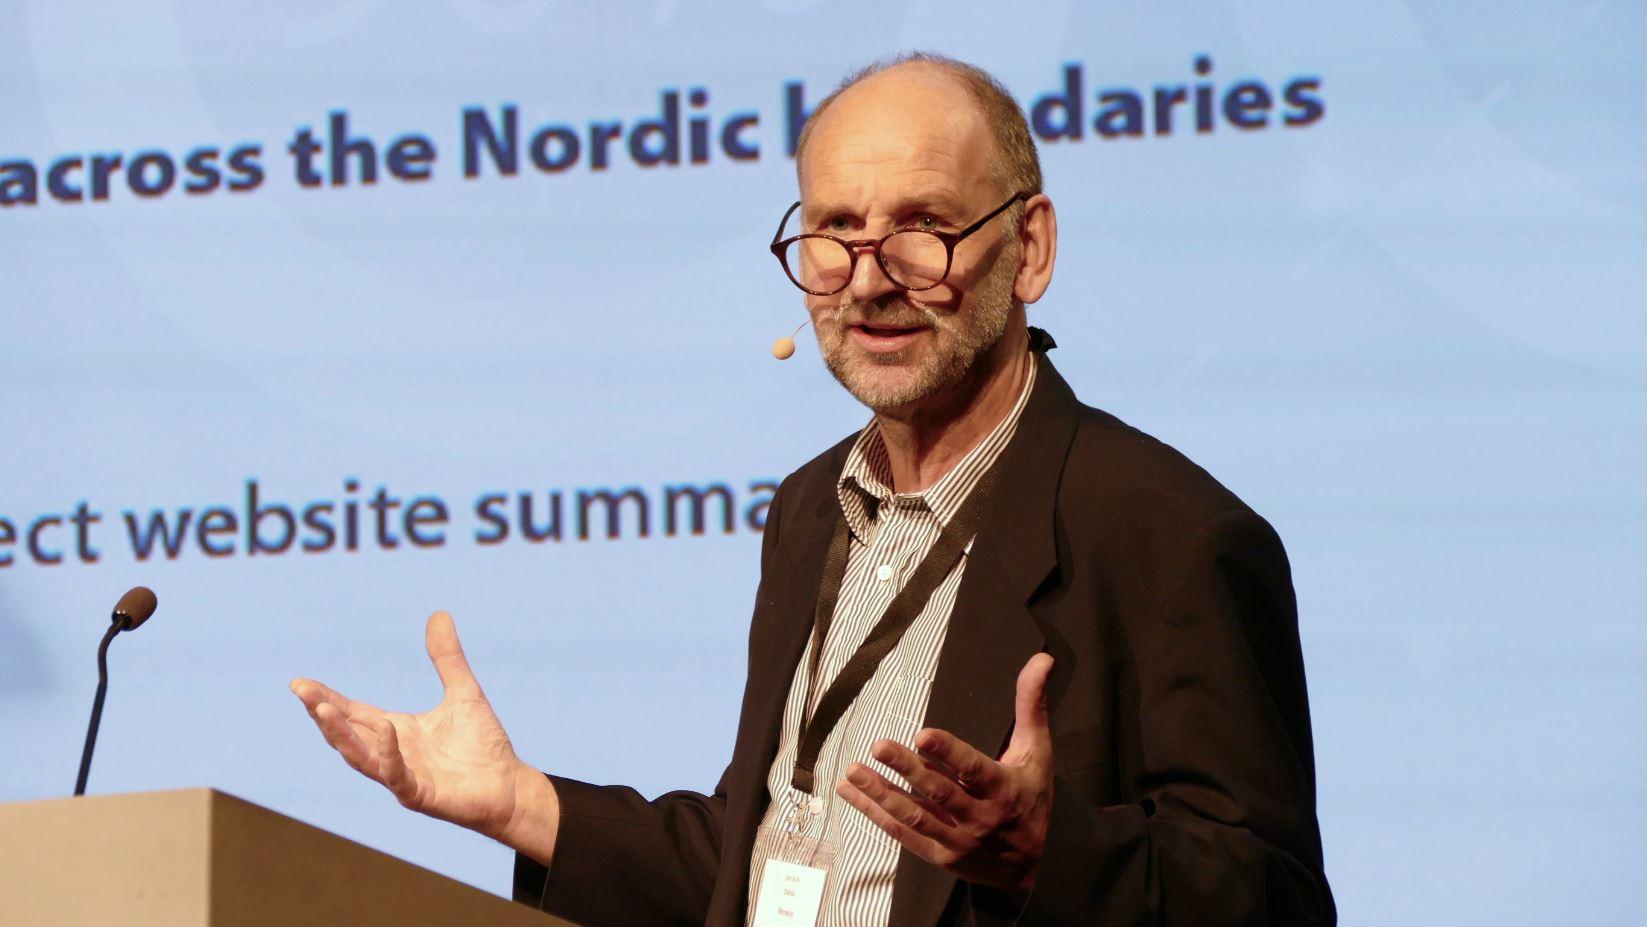 Jon Erik Dølvik: Stored demand could help create jobs